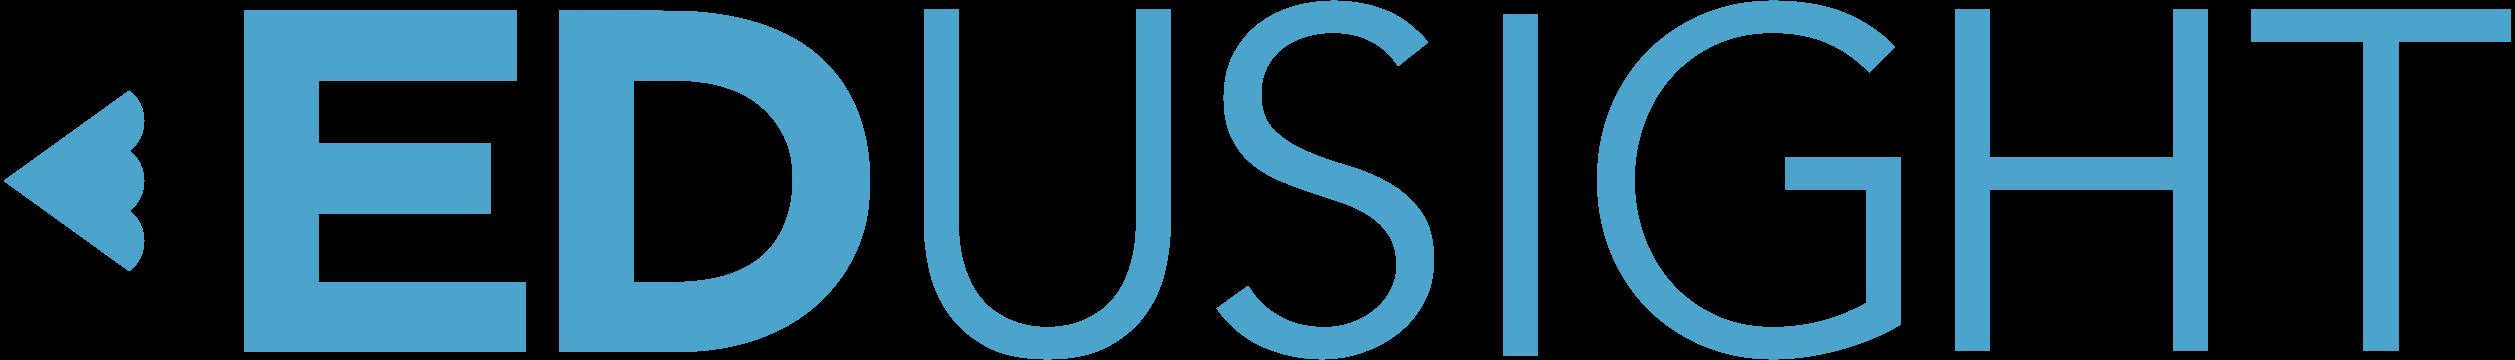 edusight_logo.jpg